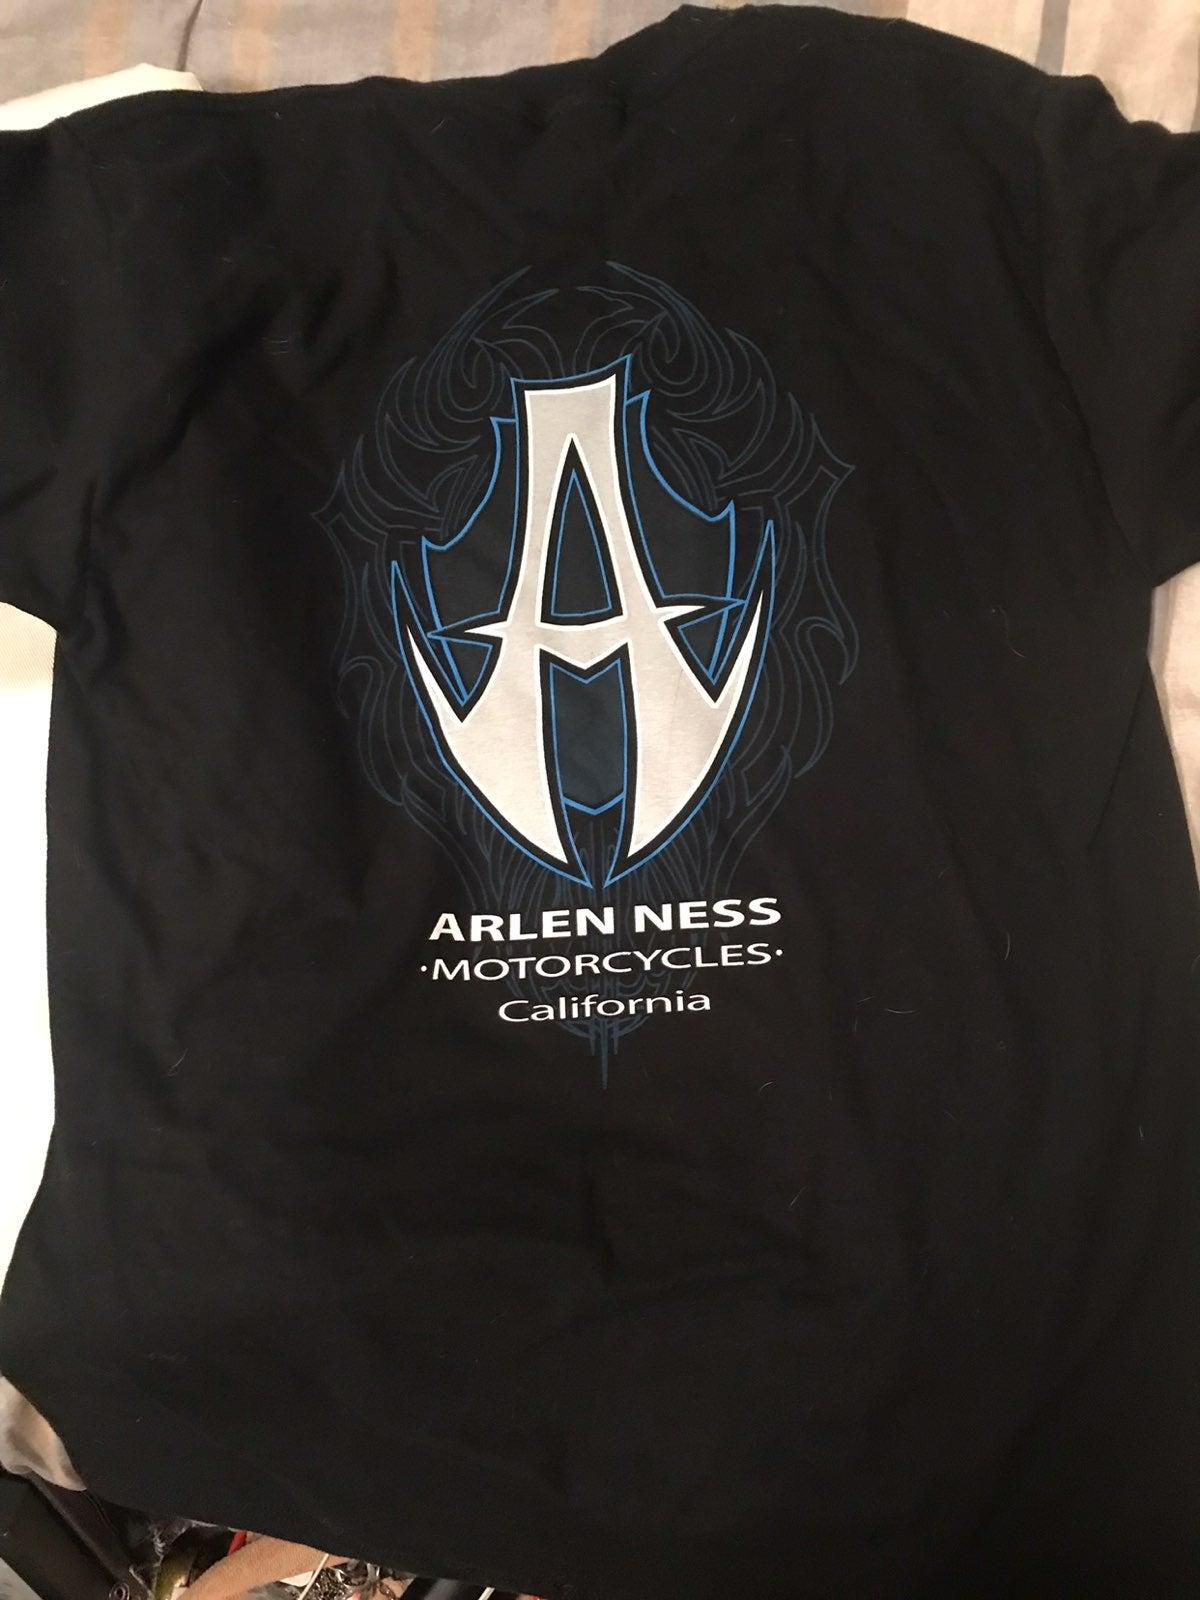 Arlen Ness Motorcycle Tee